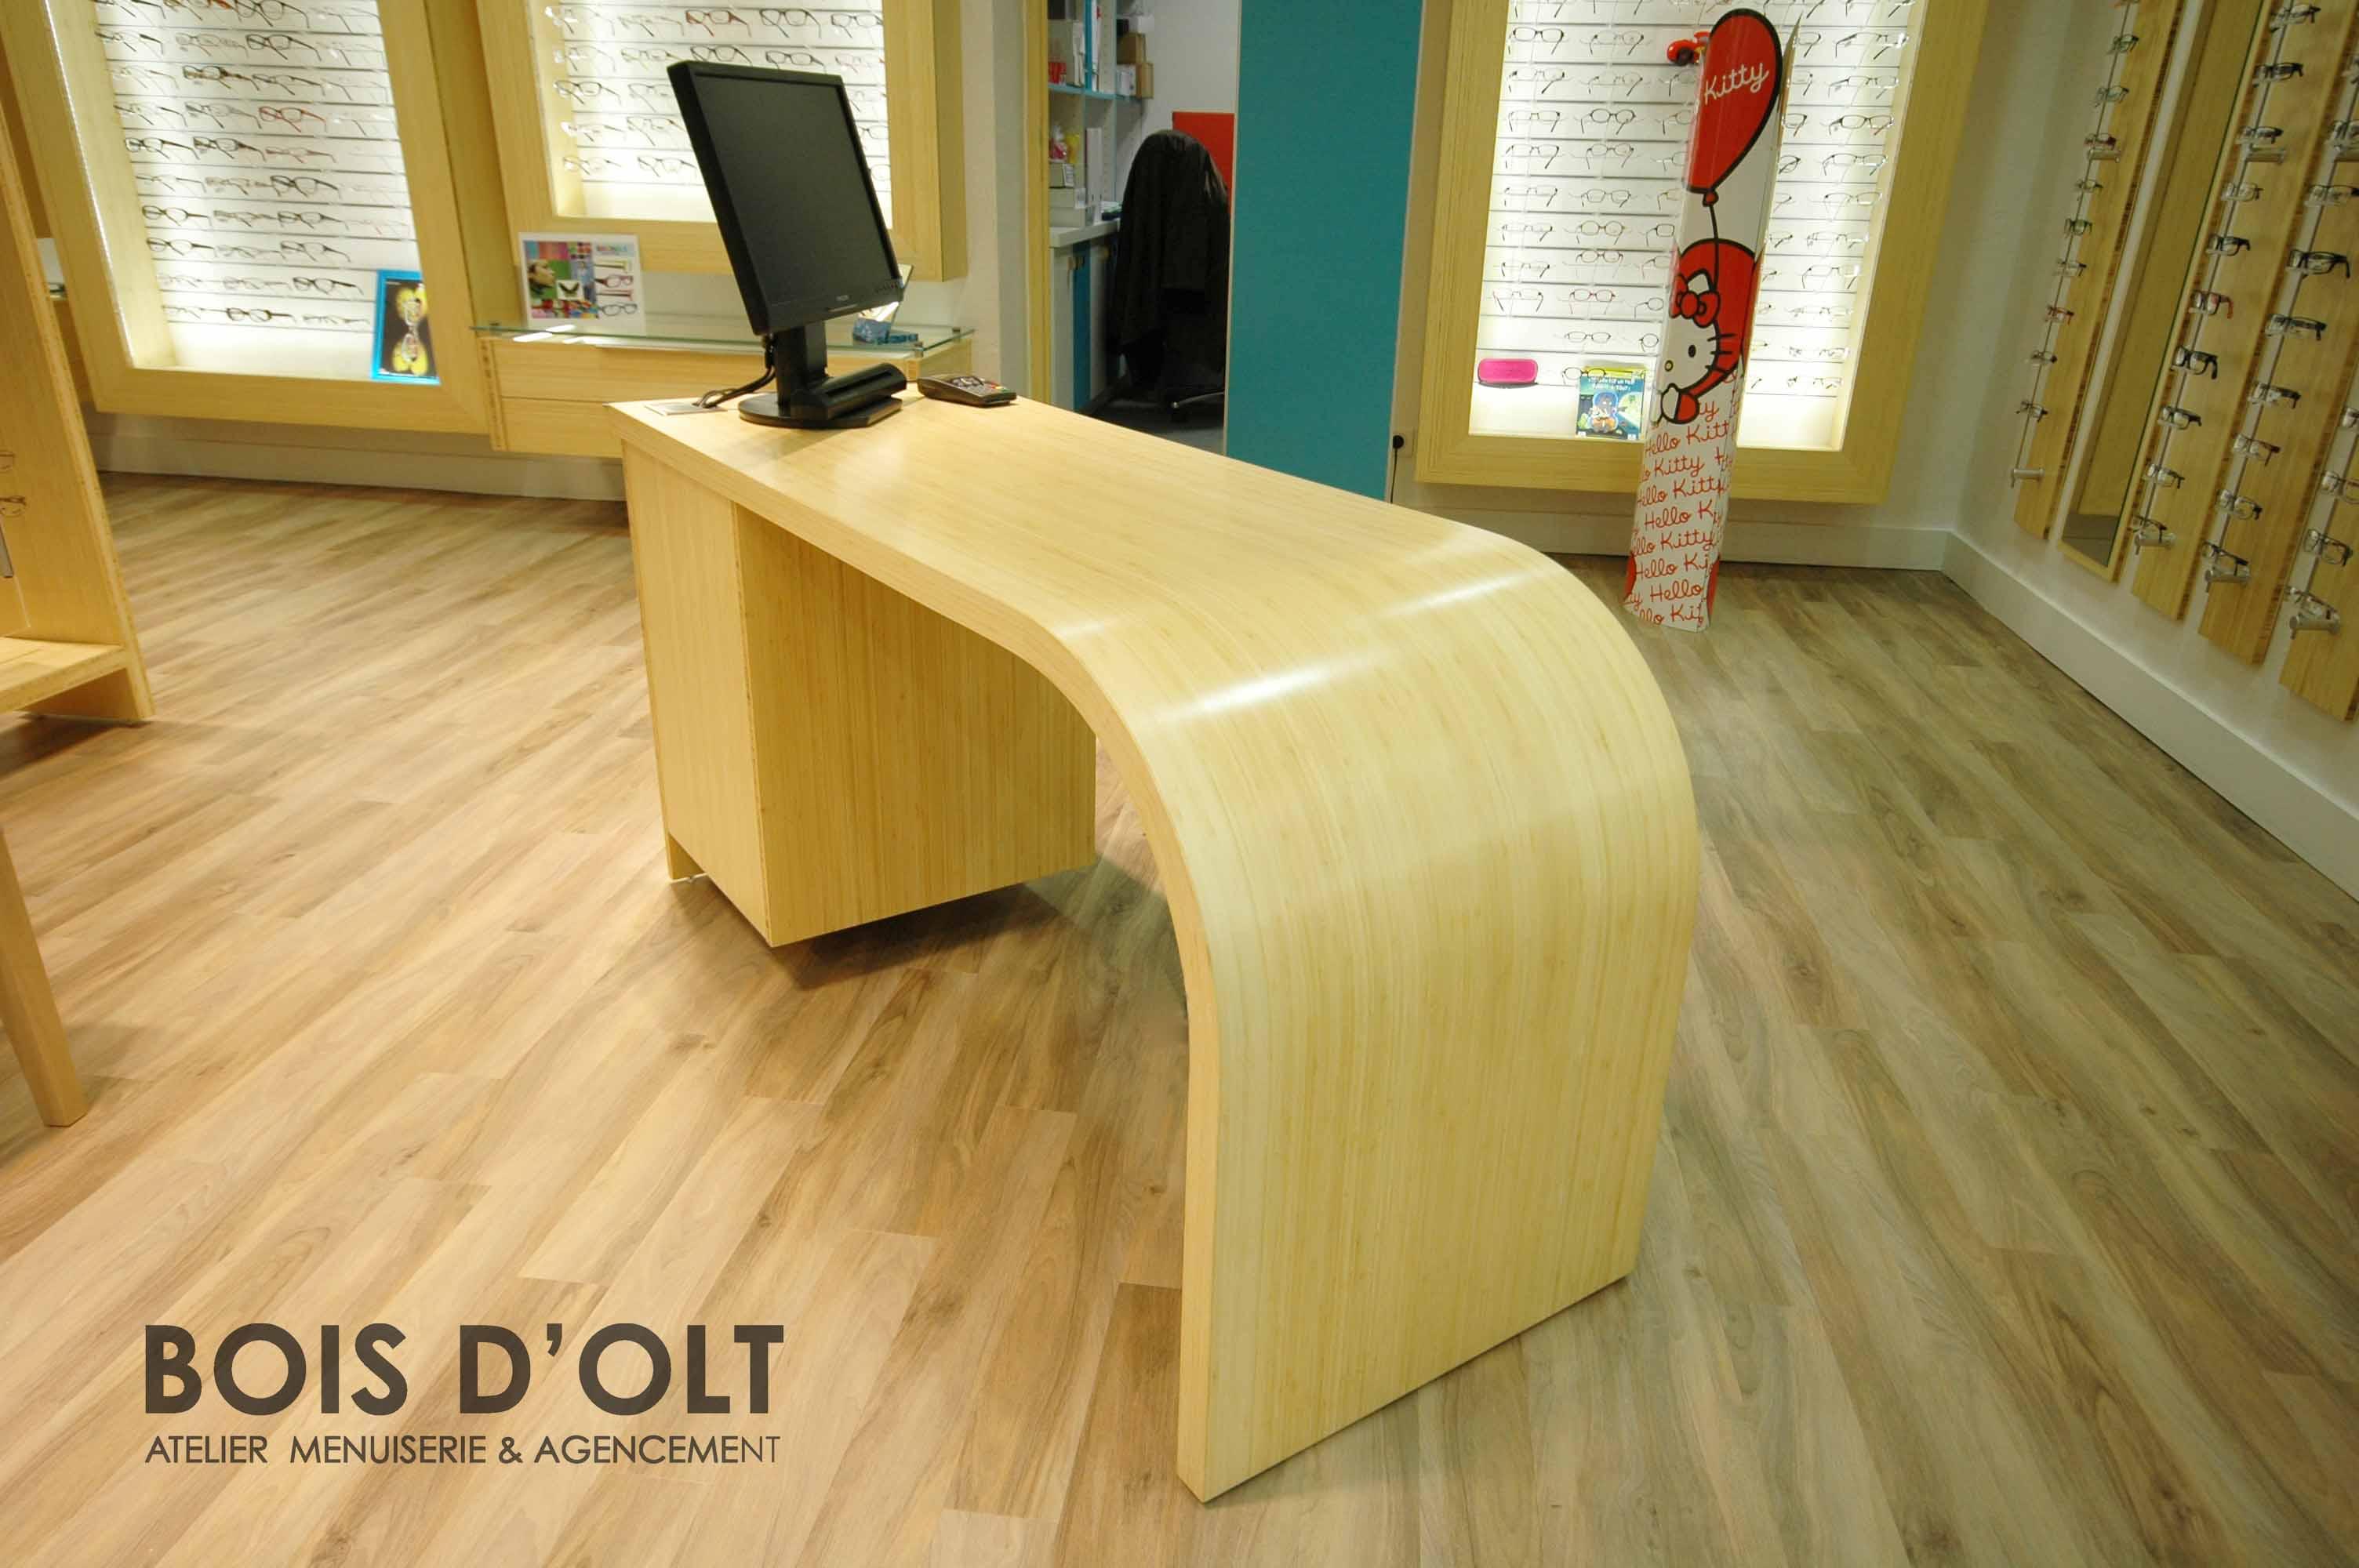 Table arrondie en placage de bambou